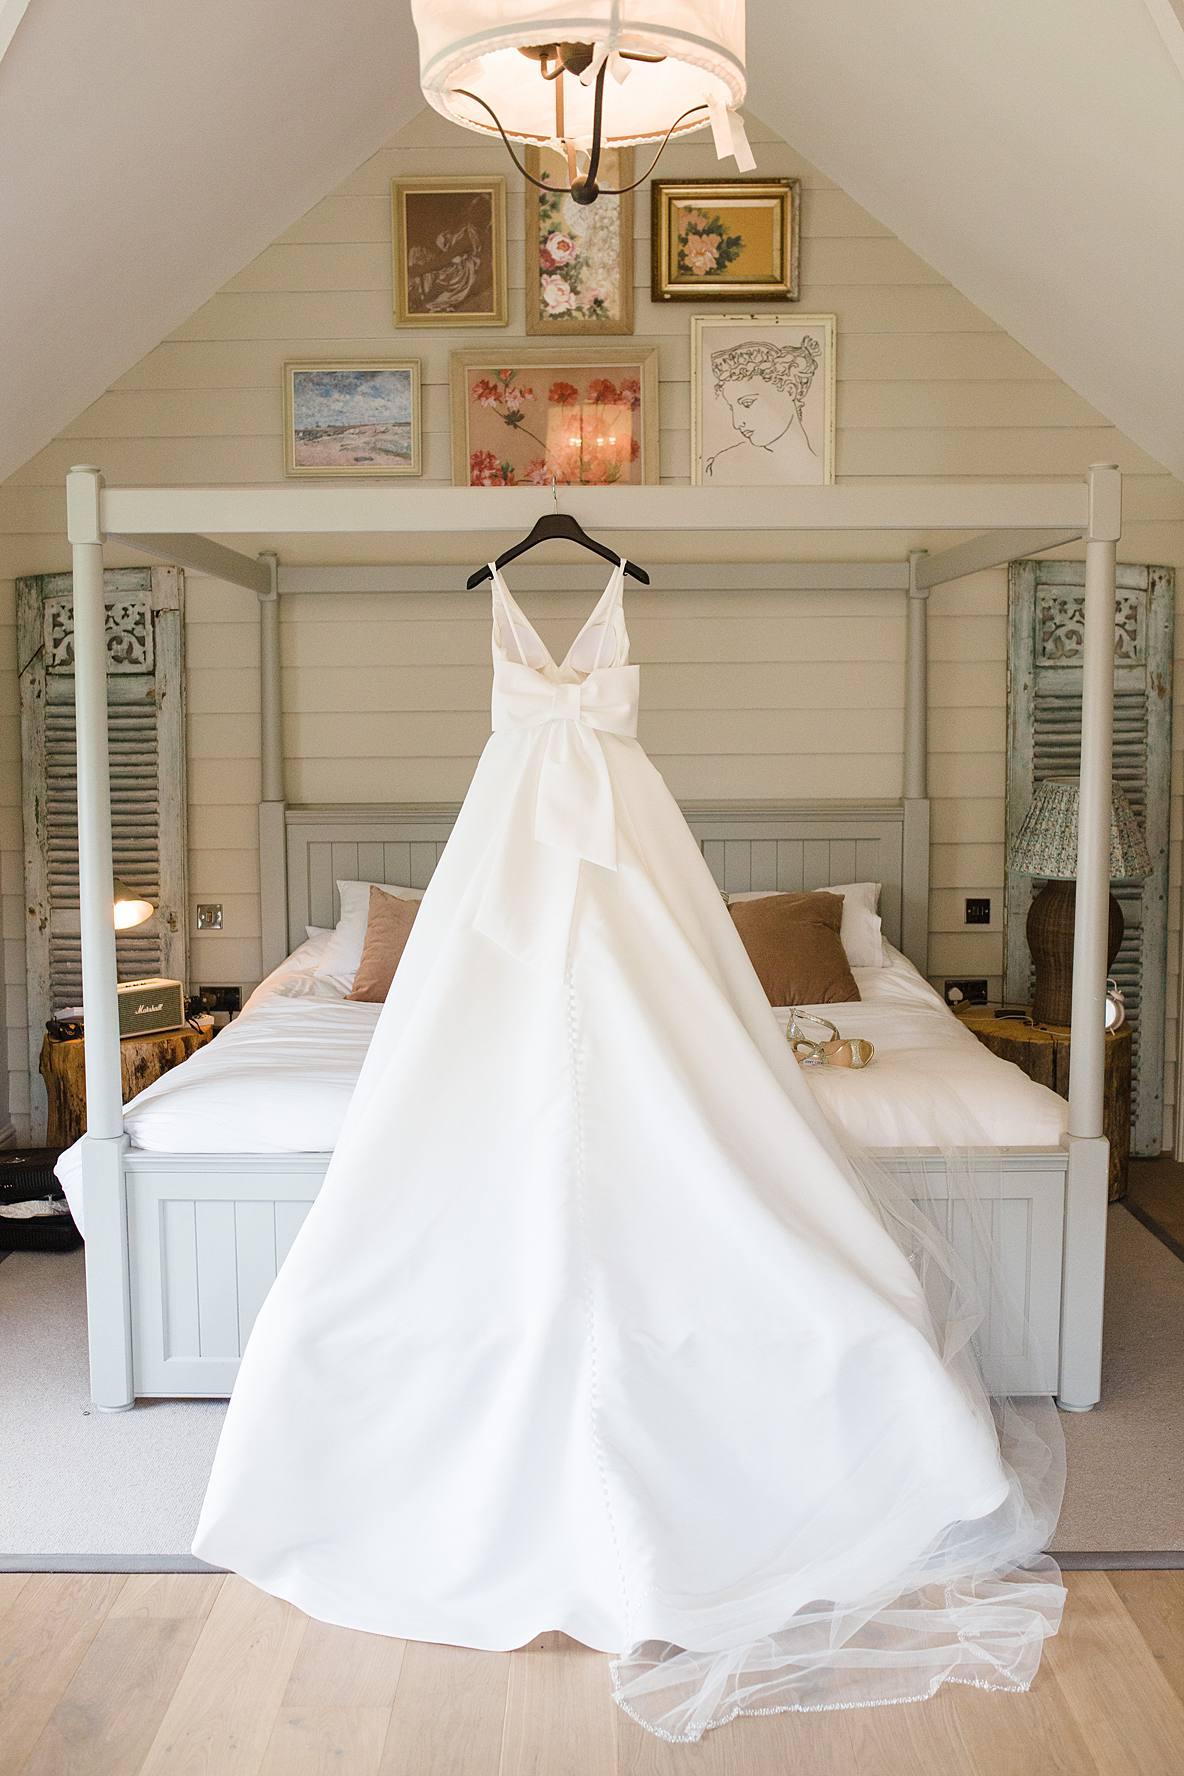 Justin Alexander wedding dress with bow